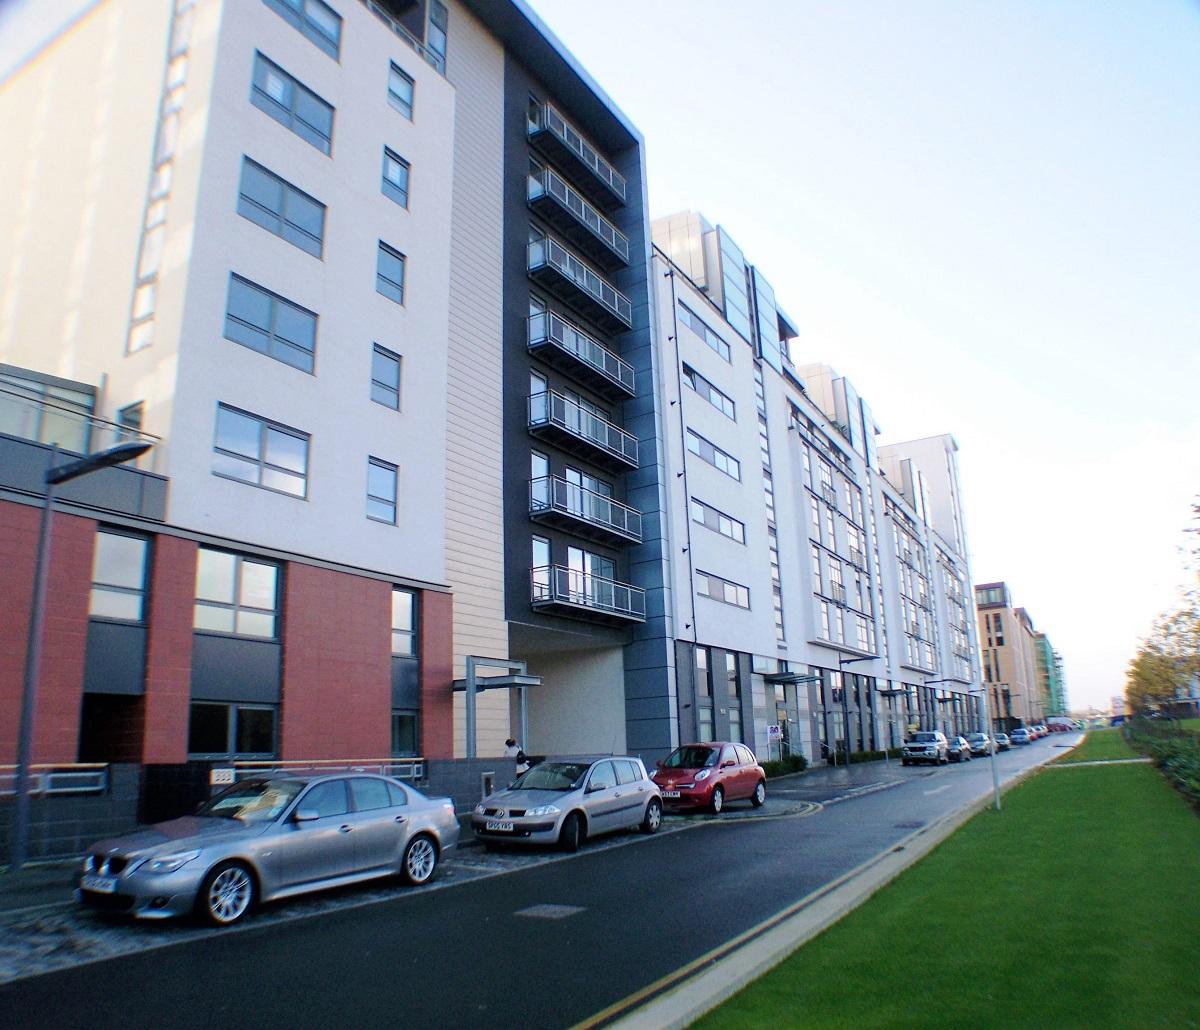 335 Glasgow Harbour Terrace 8-1 Glasgow G11 6BN